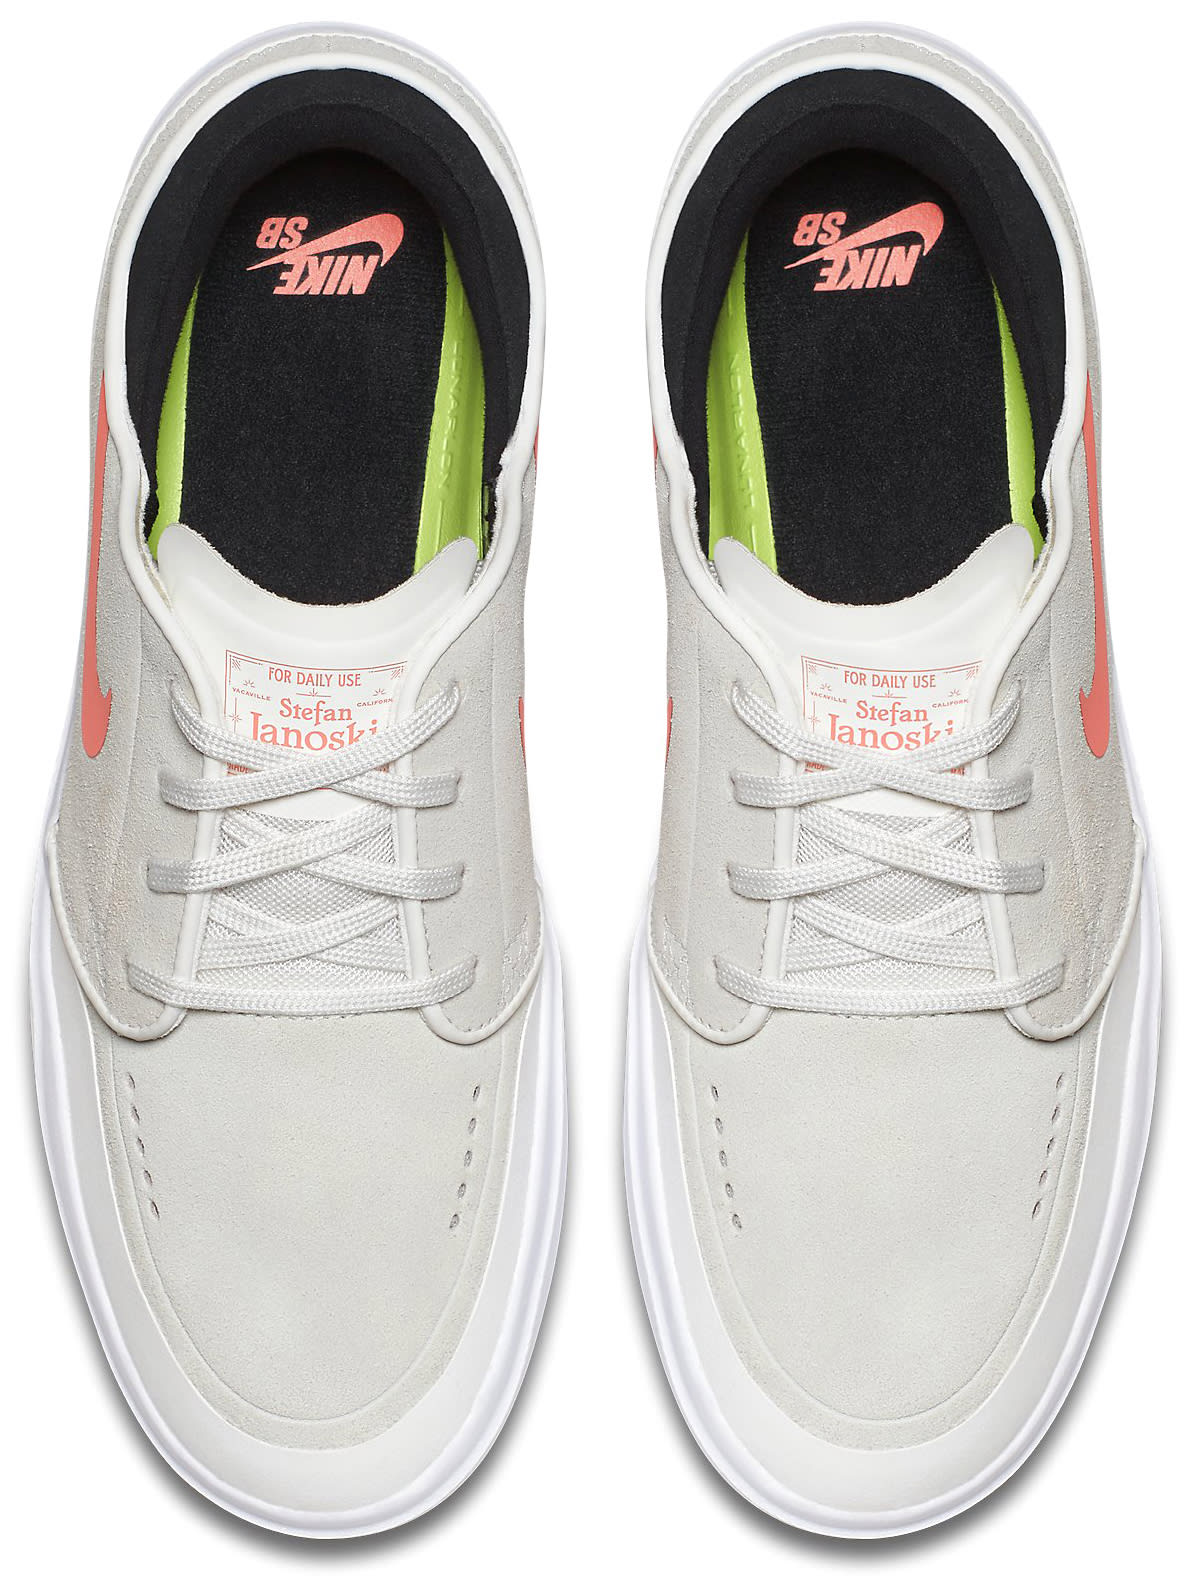 new concept fdef6 dae36 Nike Stefan Janoski Hyperfeel XT Skate Shoes - thumbnail 3